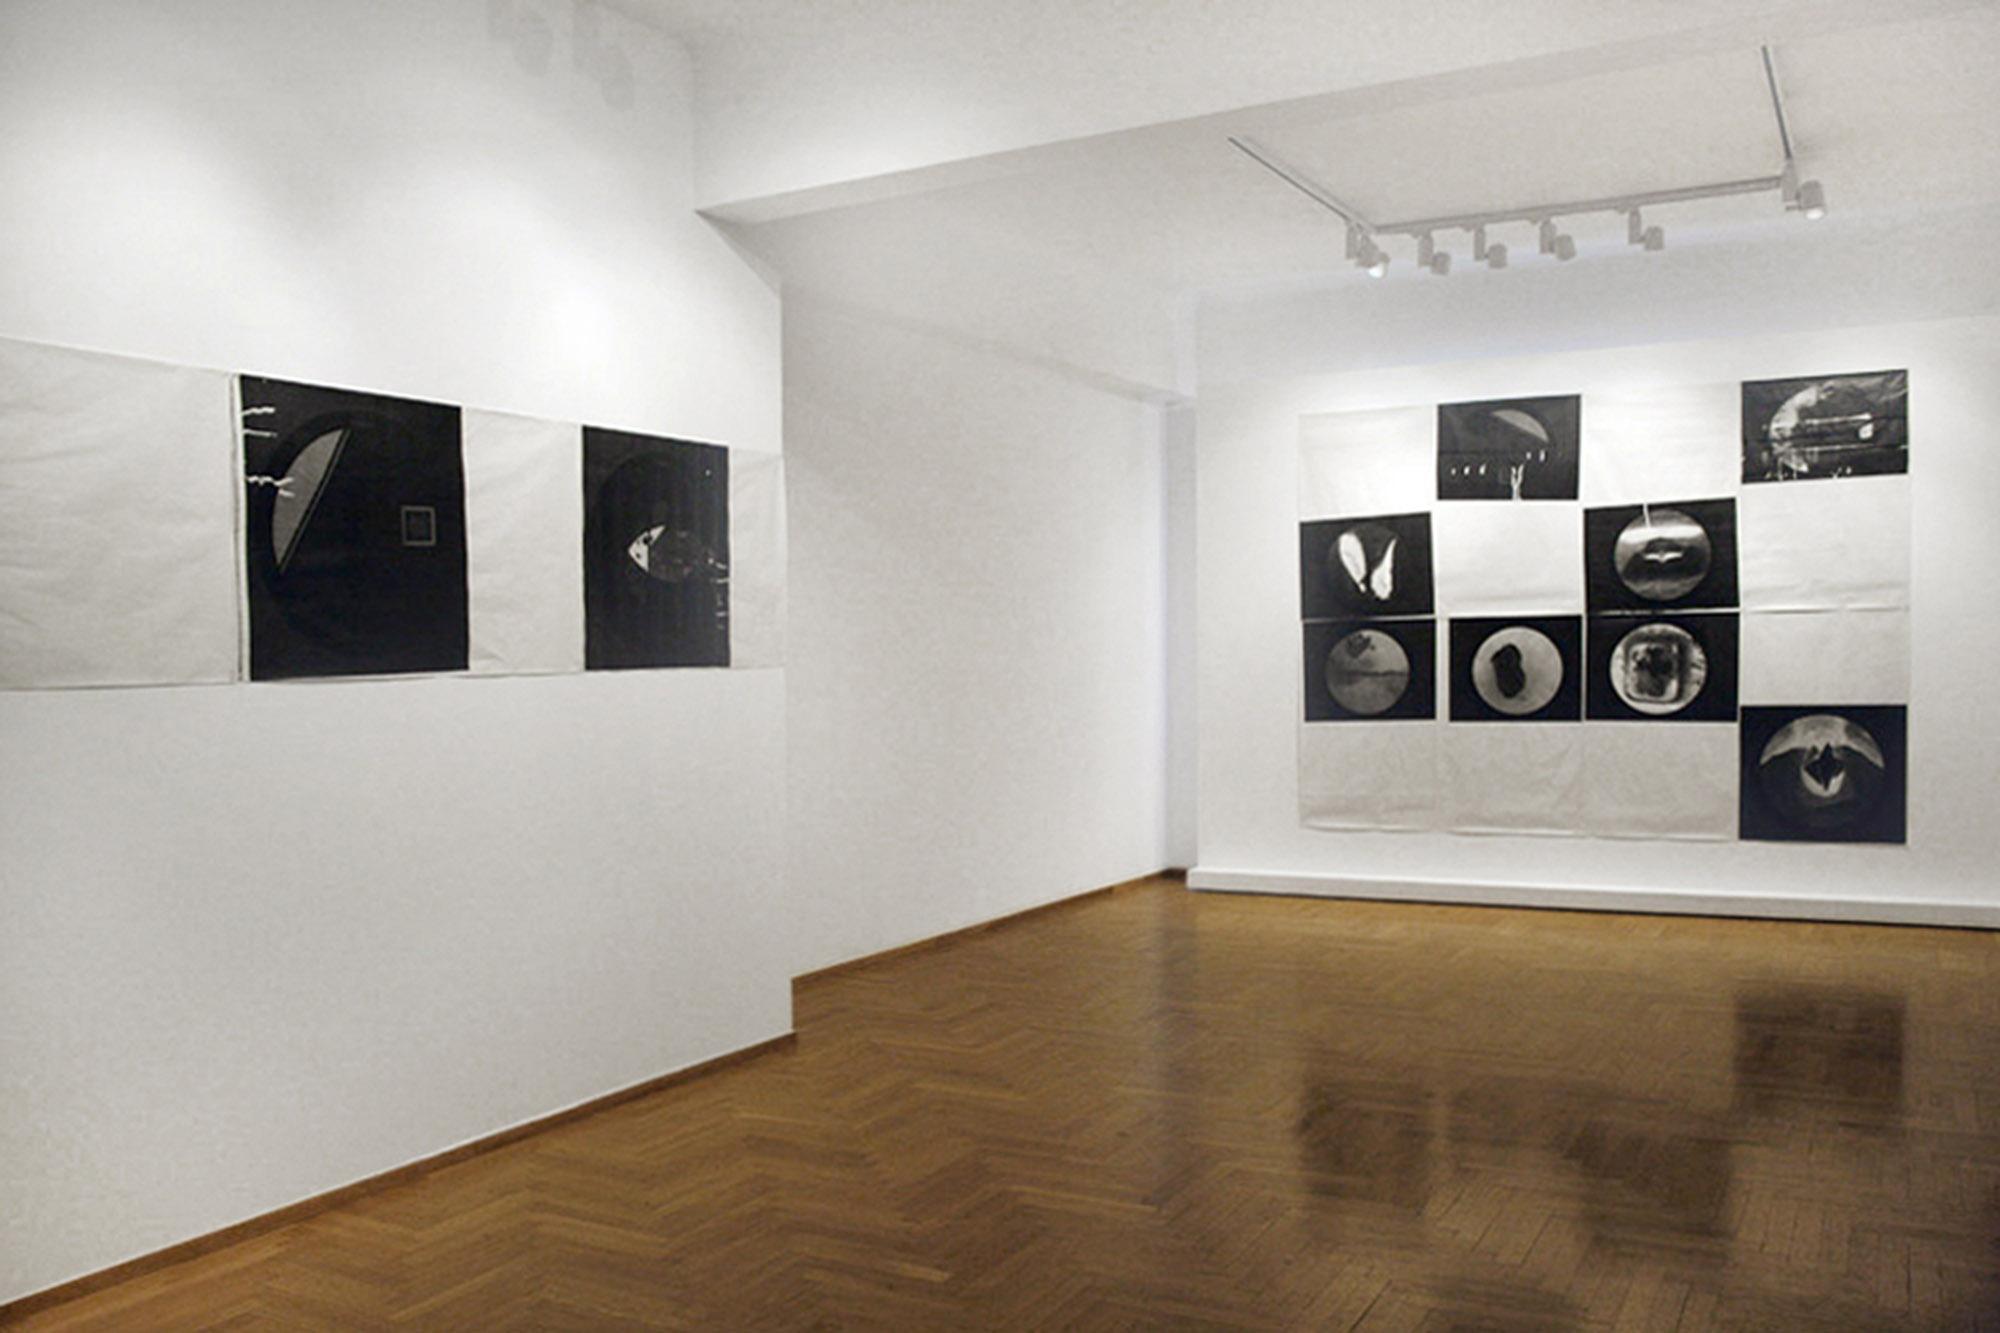 Ioanna Gouzeli / Spacesheep - Image 2